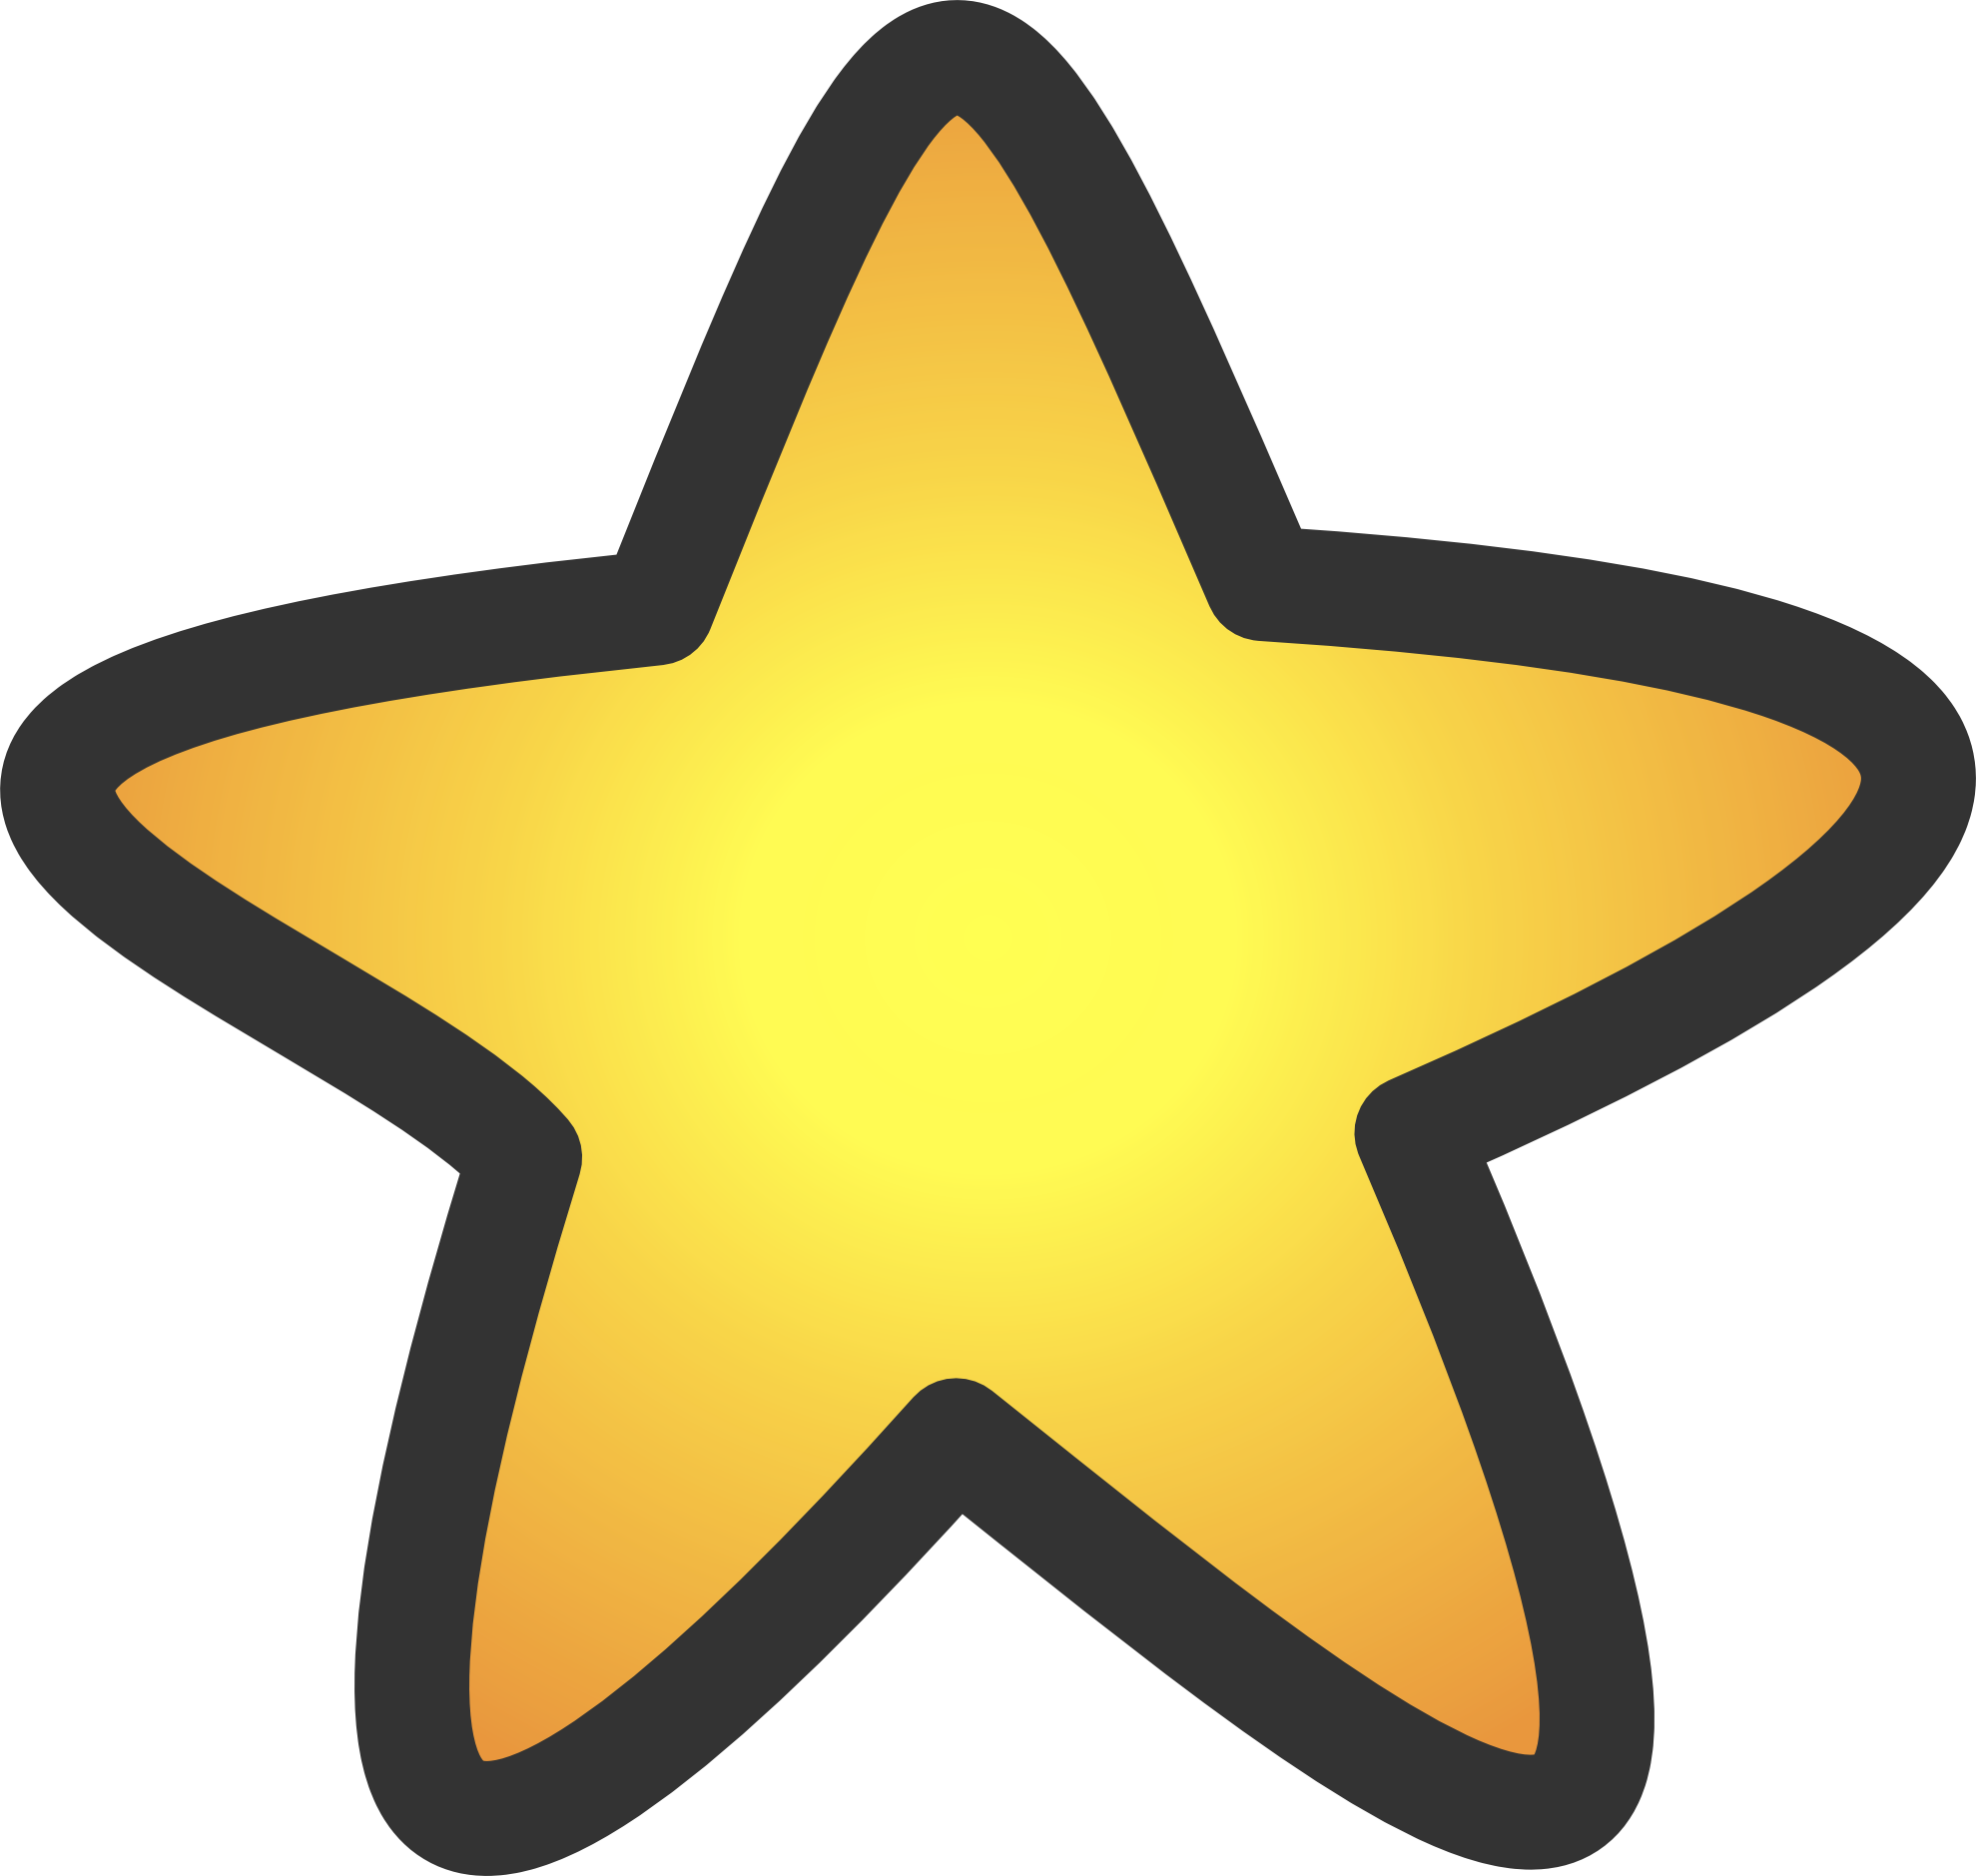 Gold star SVG - ClipArt Best - ClipArt Best